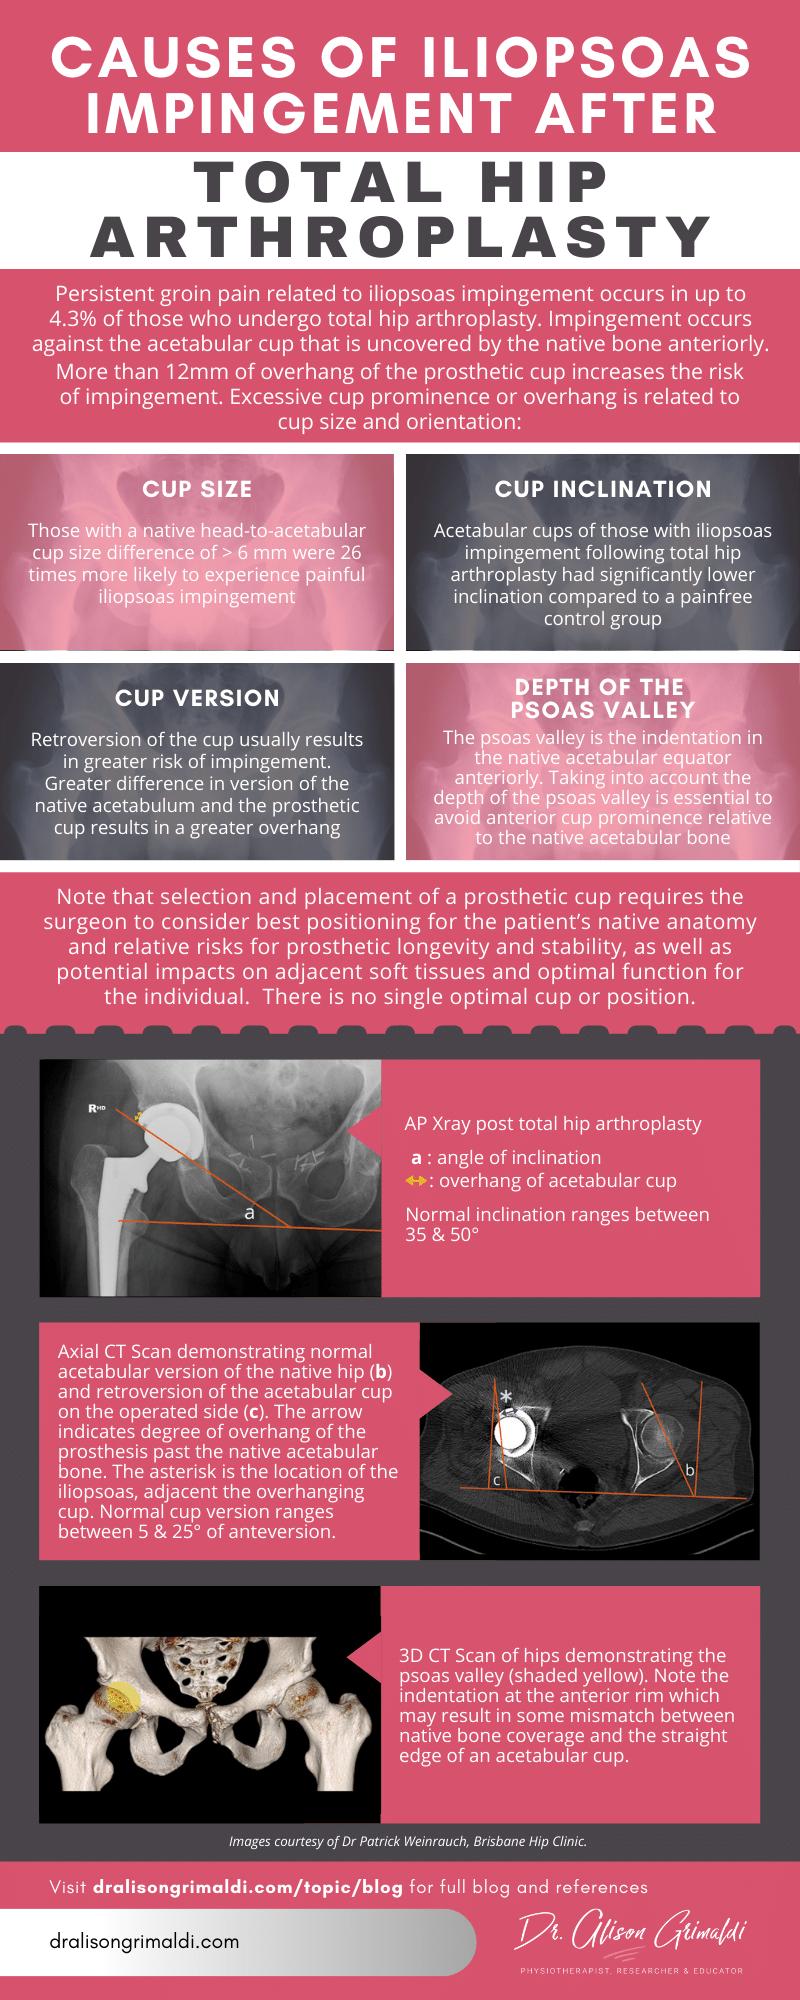 Iliopsoas impingement after THR_Alison Grimaldi Infographic from August 2020 blog